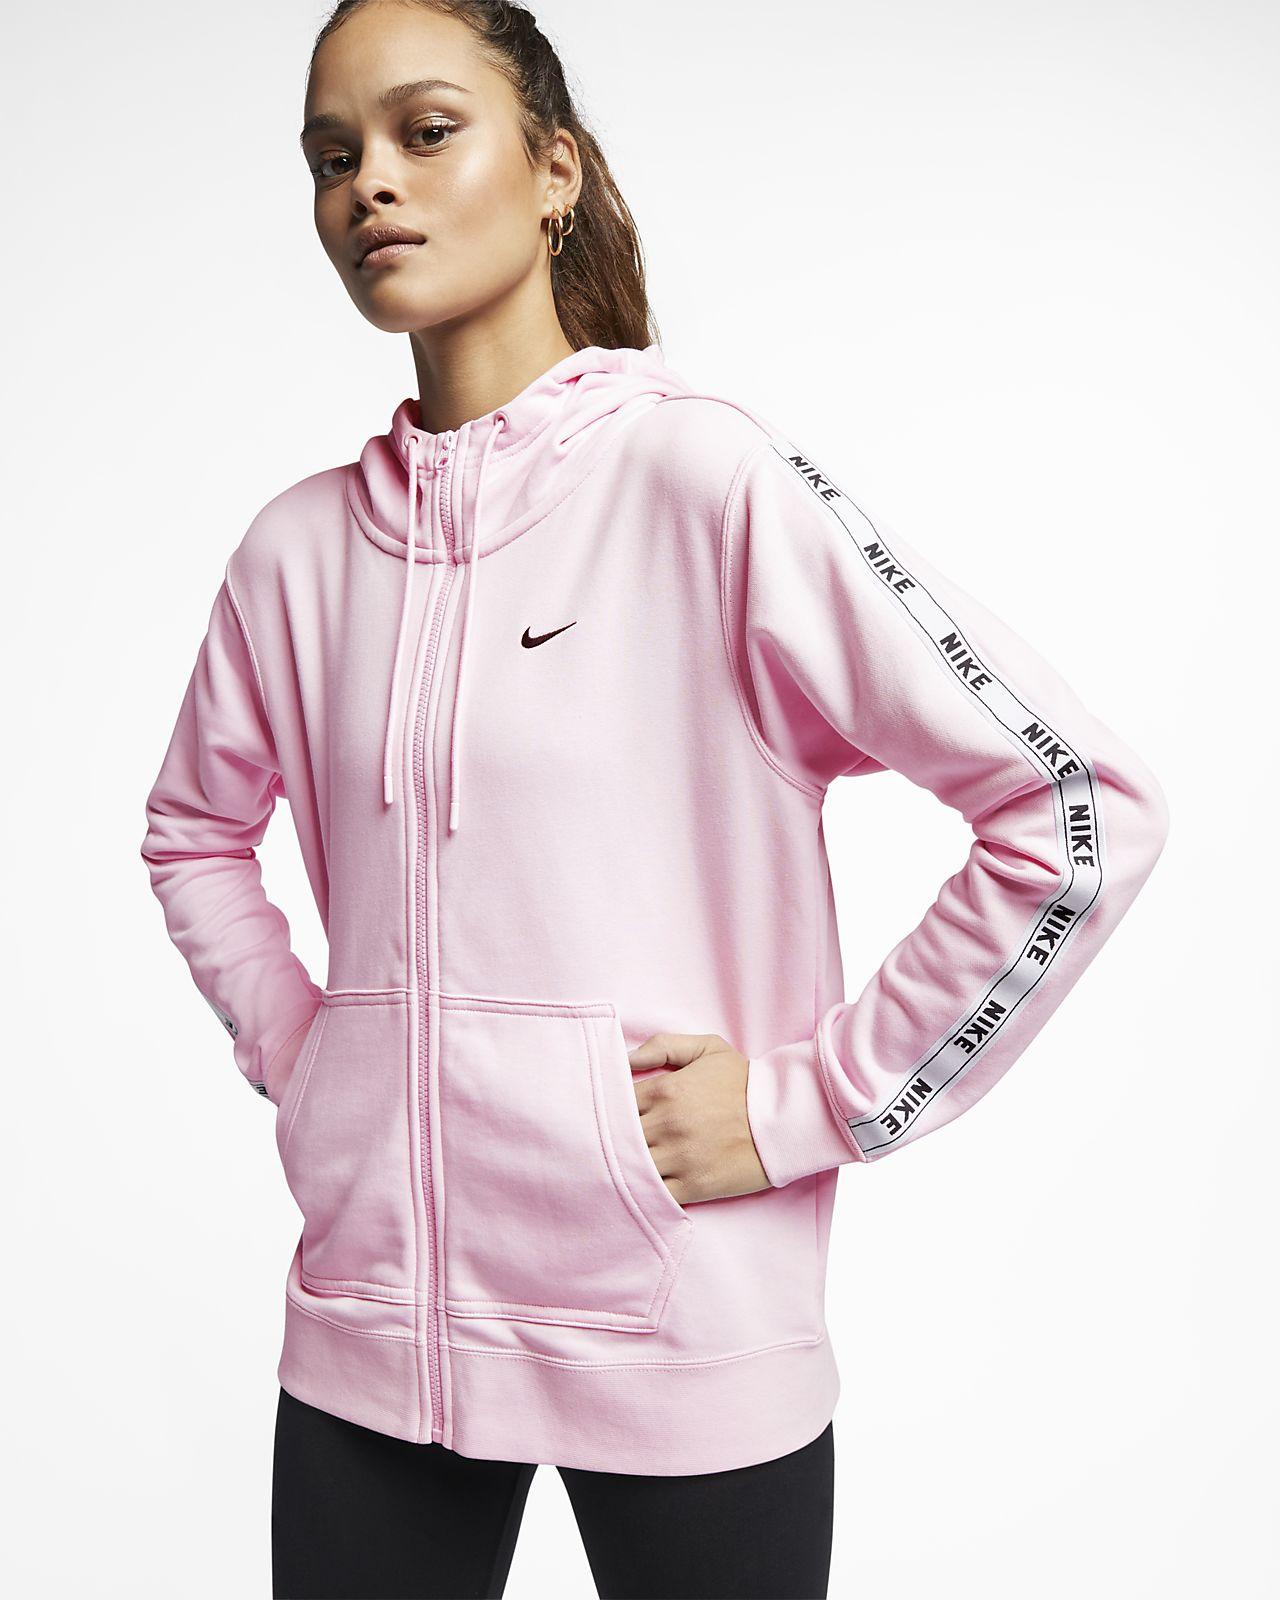 Womens Clothing Nike Sportswear Womens Logo Tape Hoodie